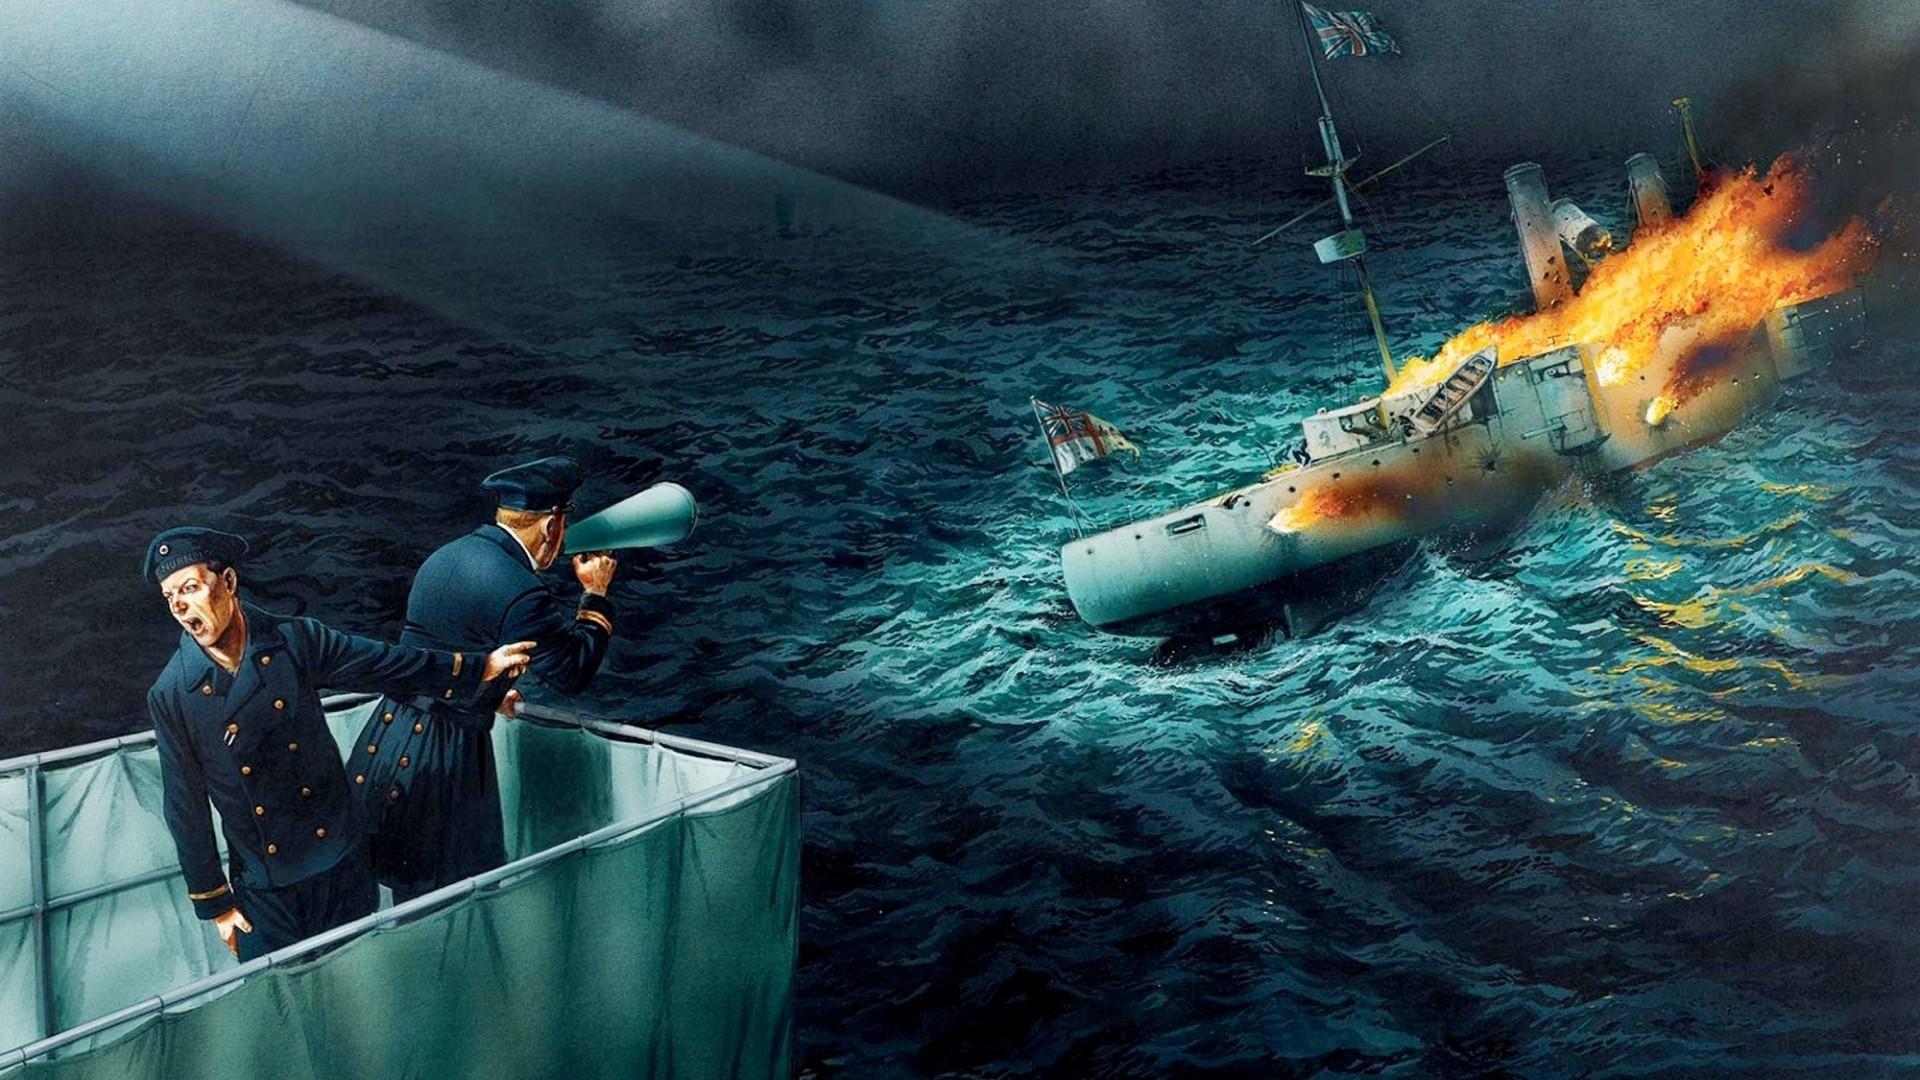 Res: 1920x1080, Sinking Wallpaper